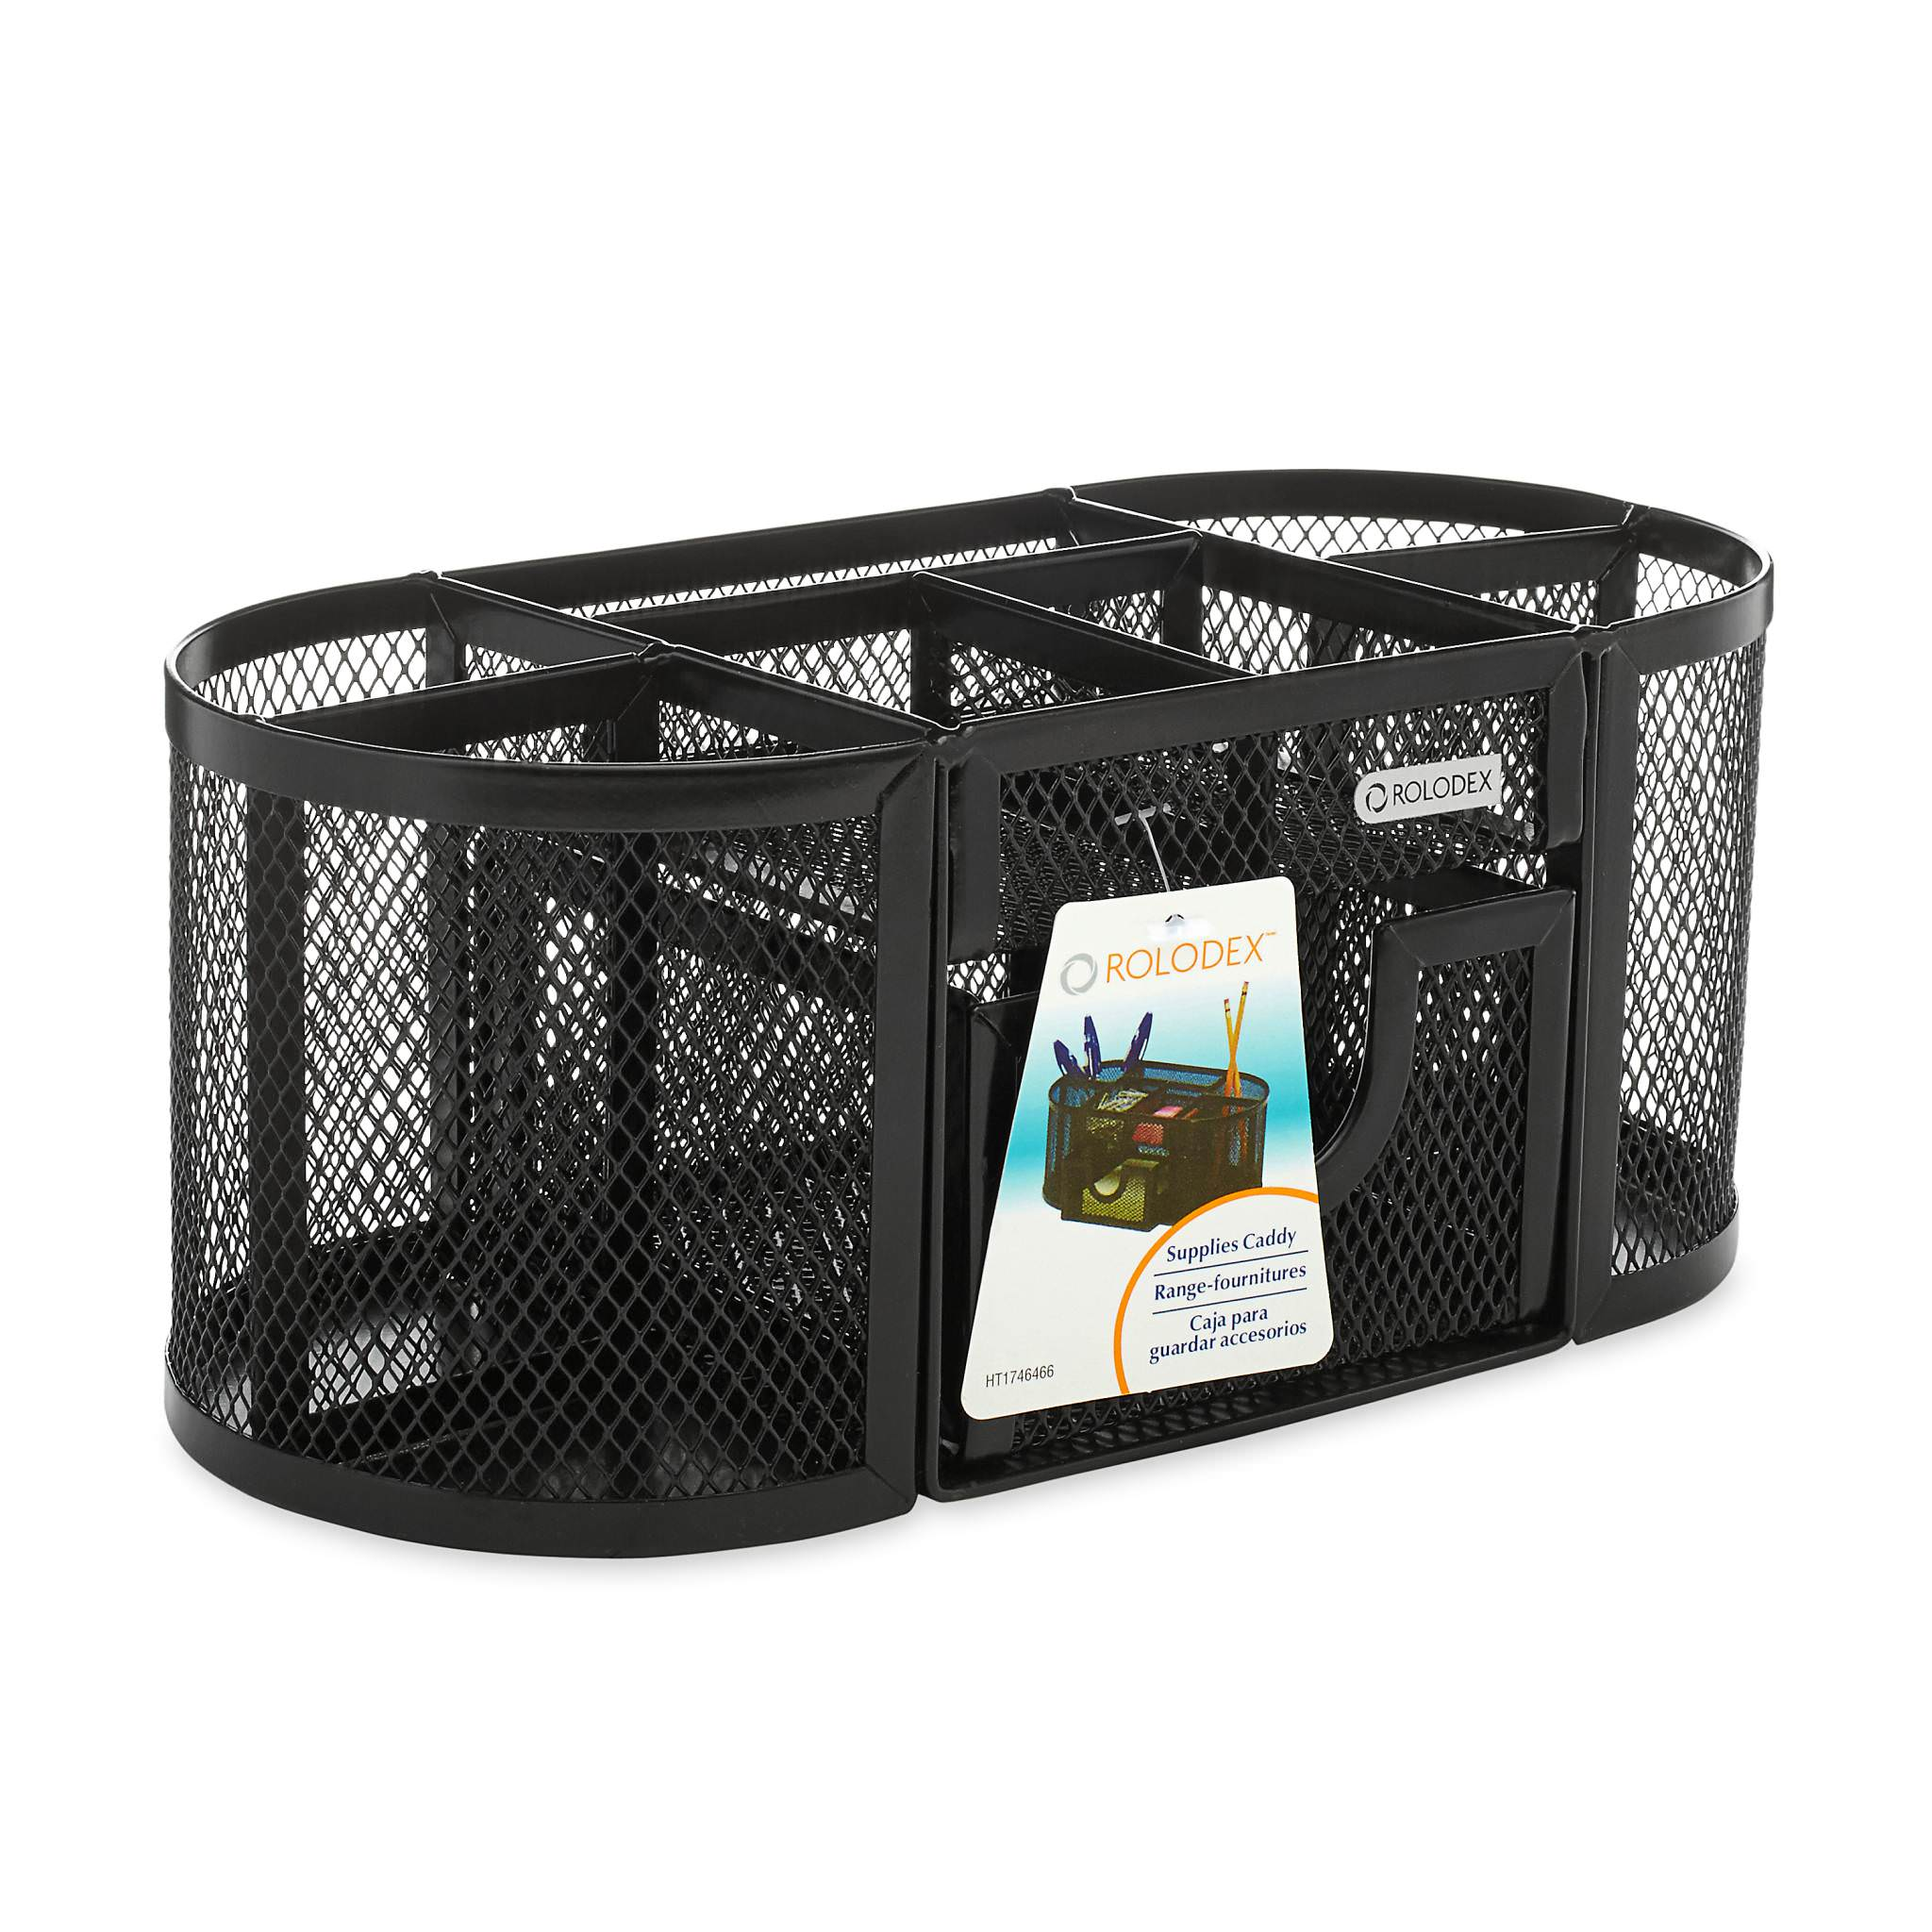 Rolodex Oval Supply Caddy, Metal Mesh, Black